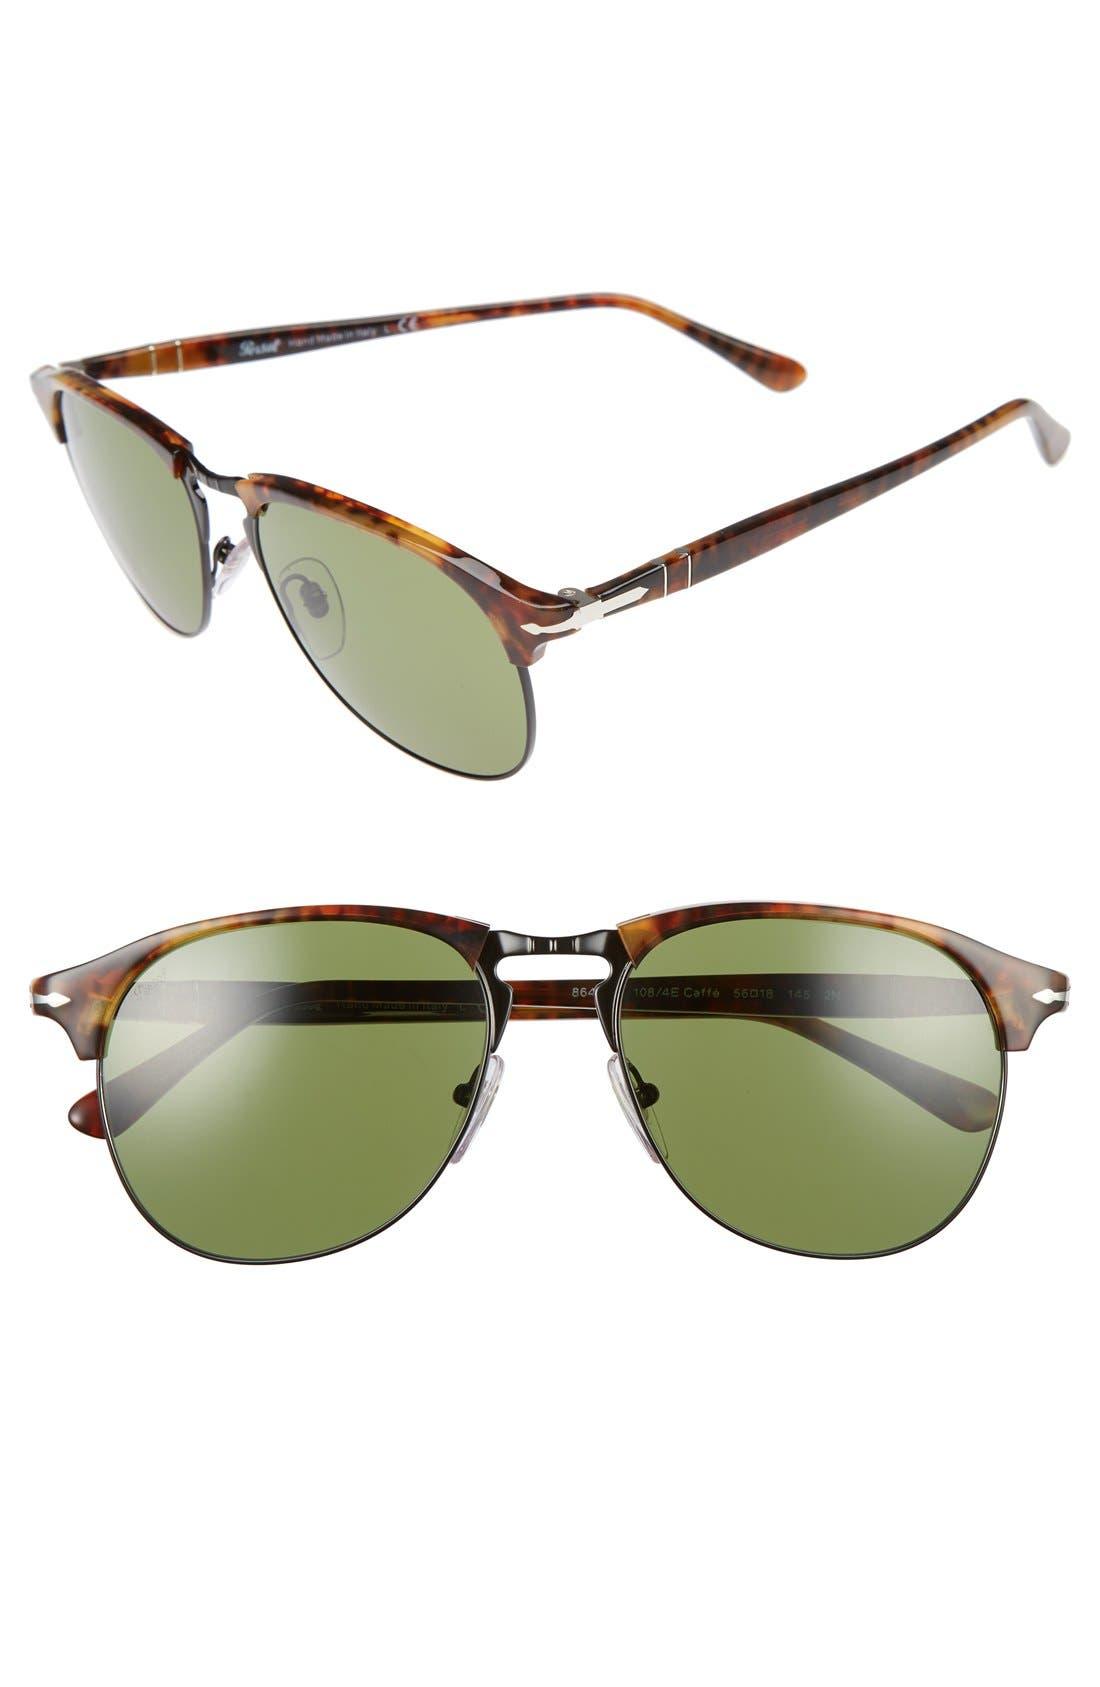 56mm Keyhole Sunglasses,                         Main,                         color, DARK HAVANA